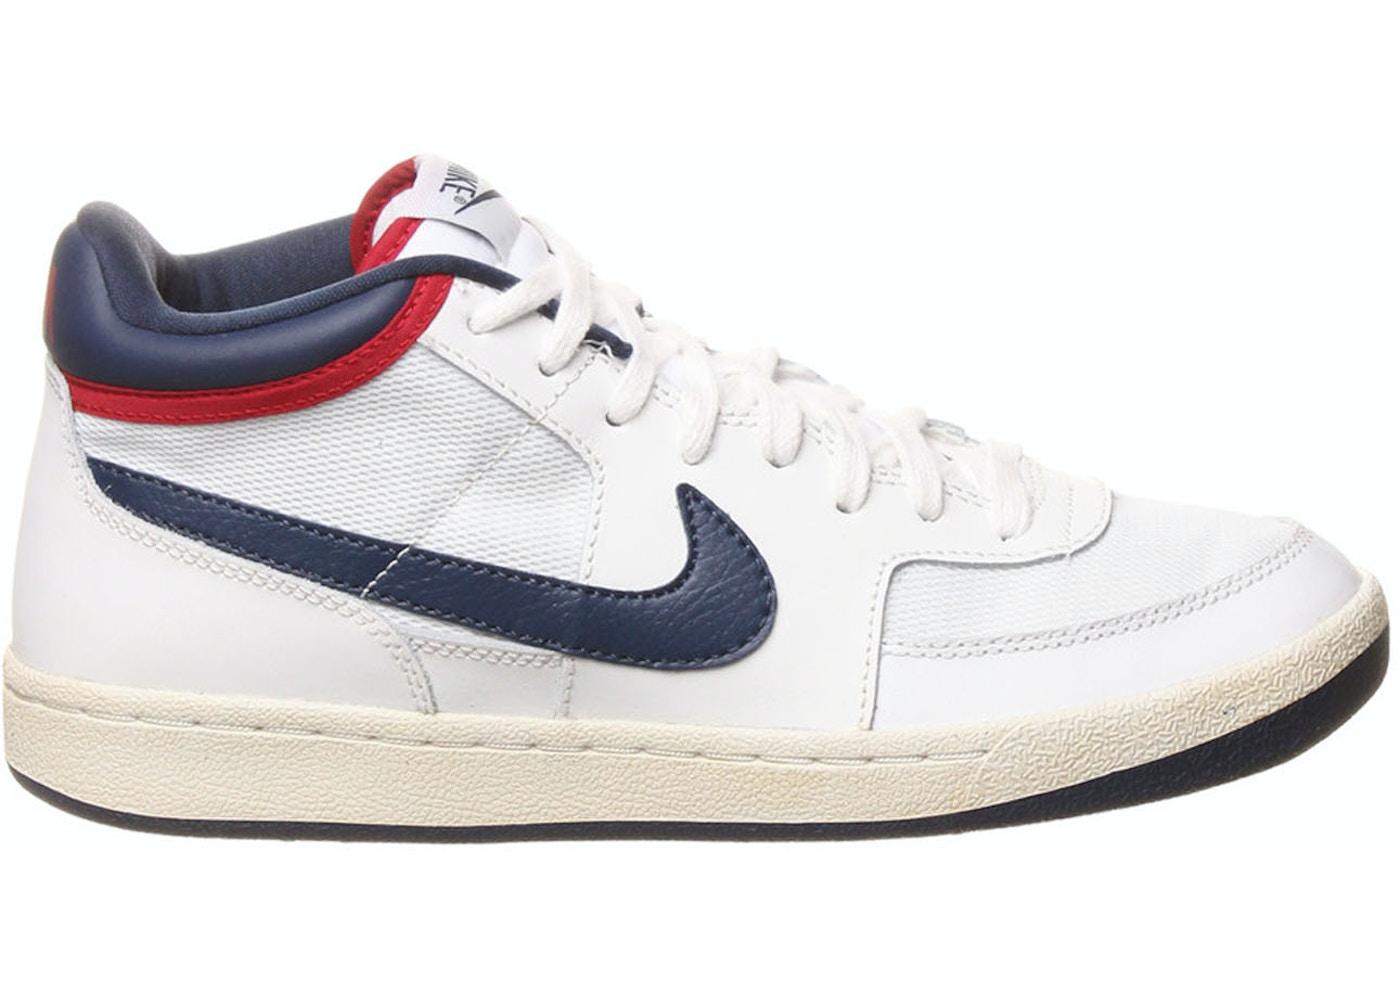 estilo clásico comprar online Calidad superior Nike Challenge Court Mid VNTG Summit White - 519106-160